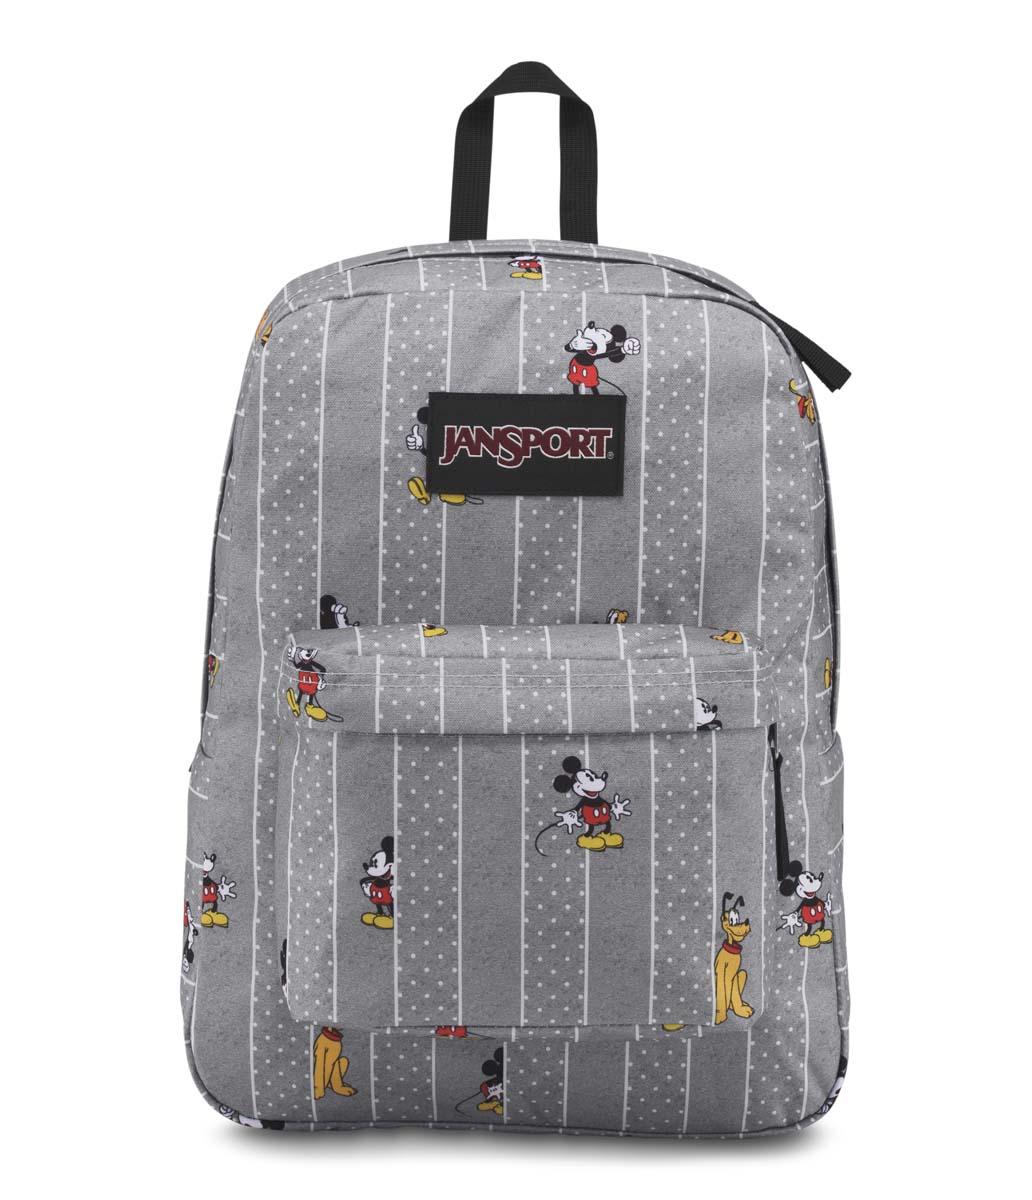 JanSport กระเป๋าเป้ รุ่น Superbreak - Disney Hide And Seek